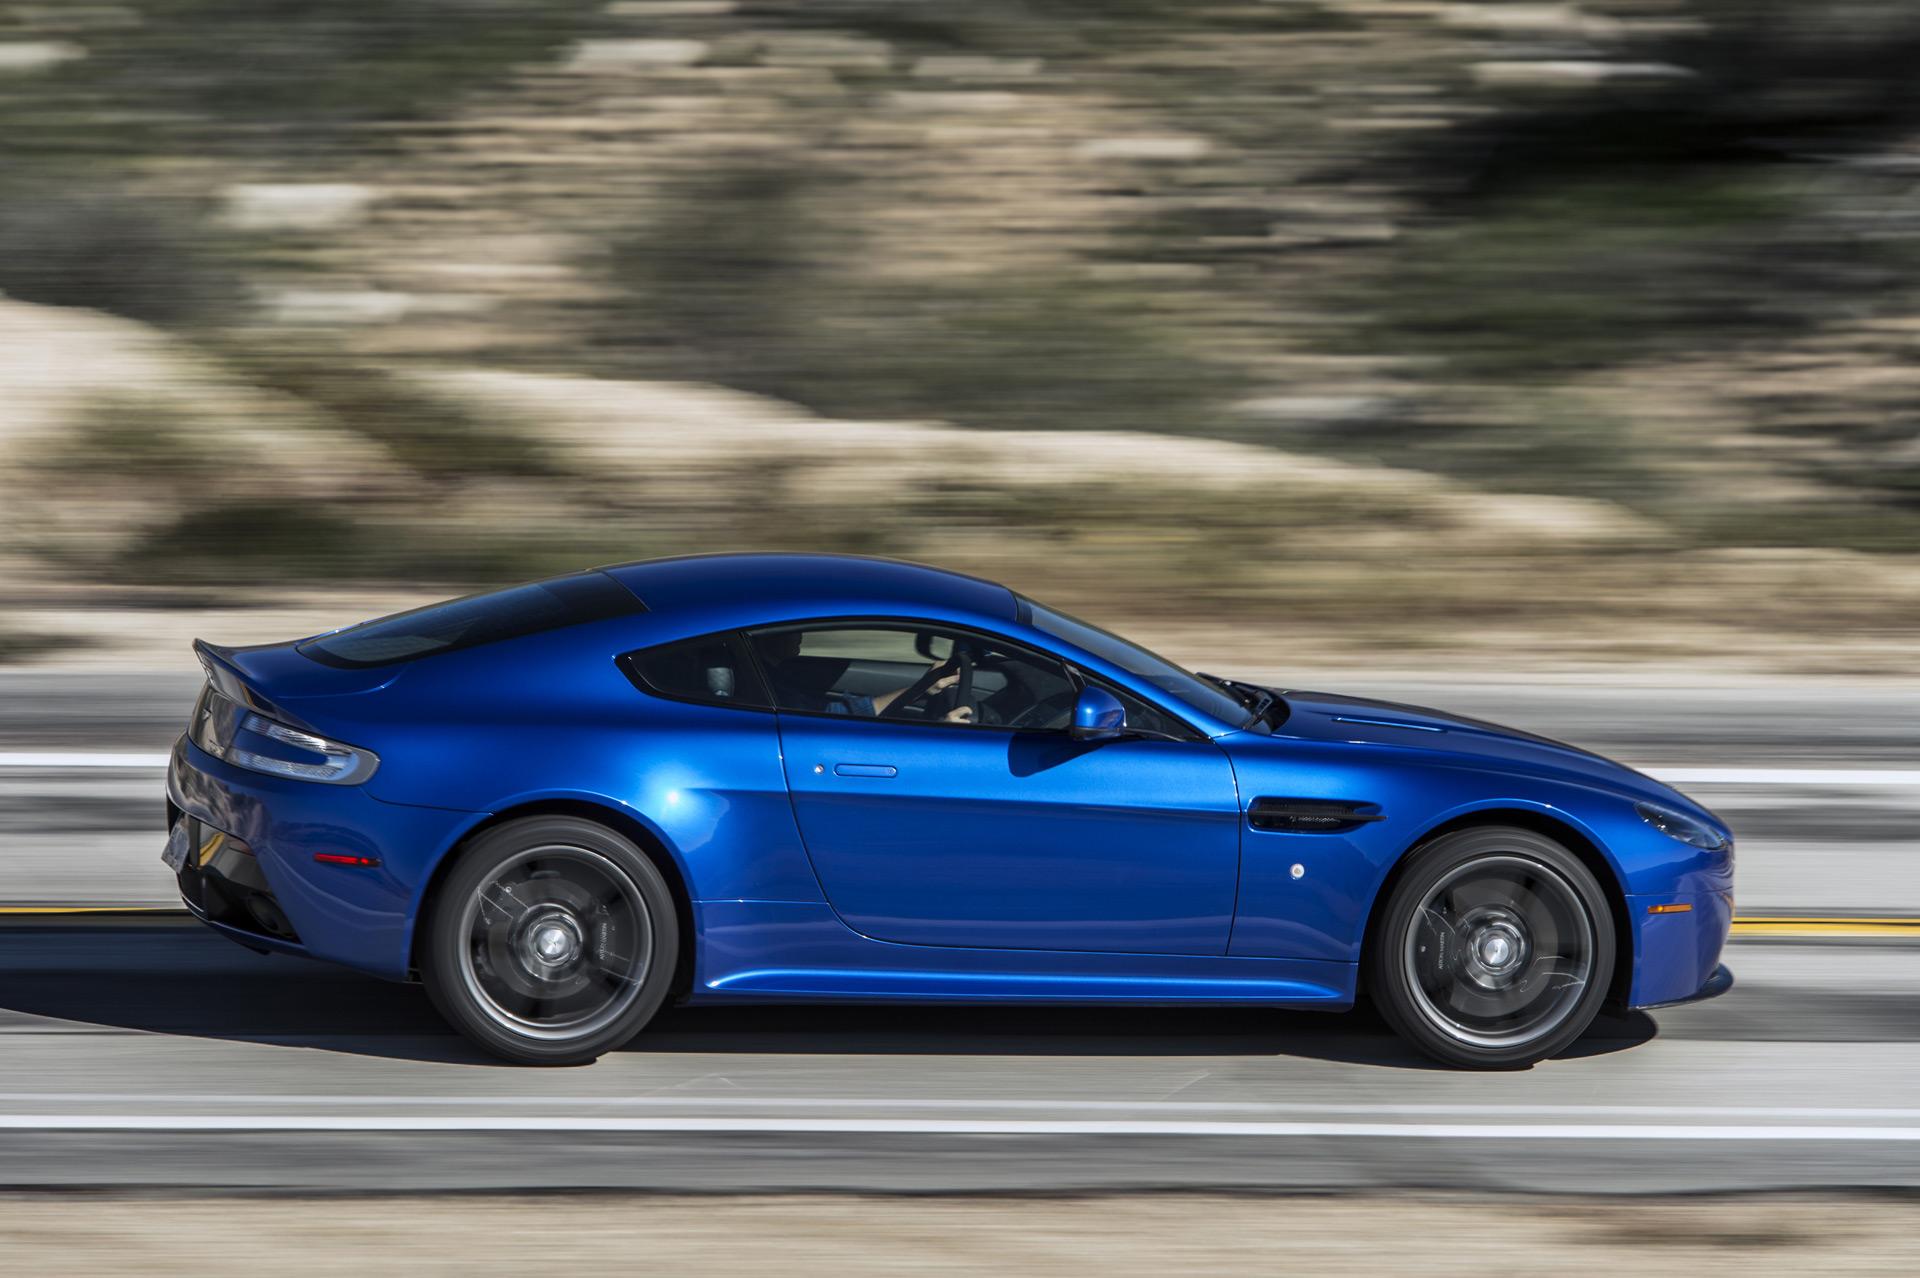 2017 Aston Martin Vantage preview